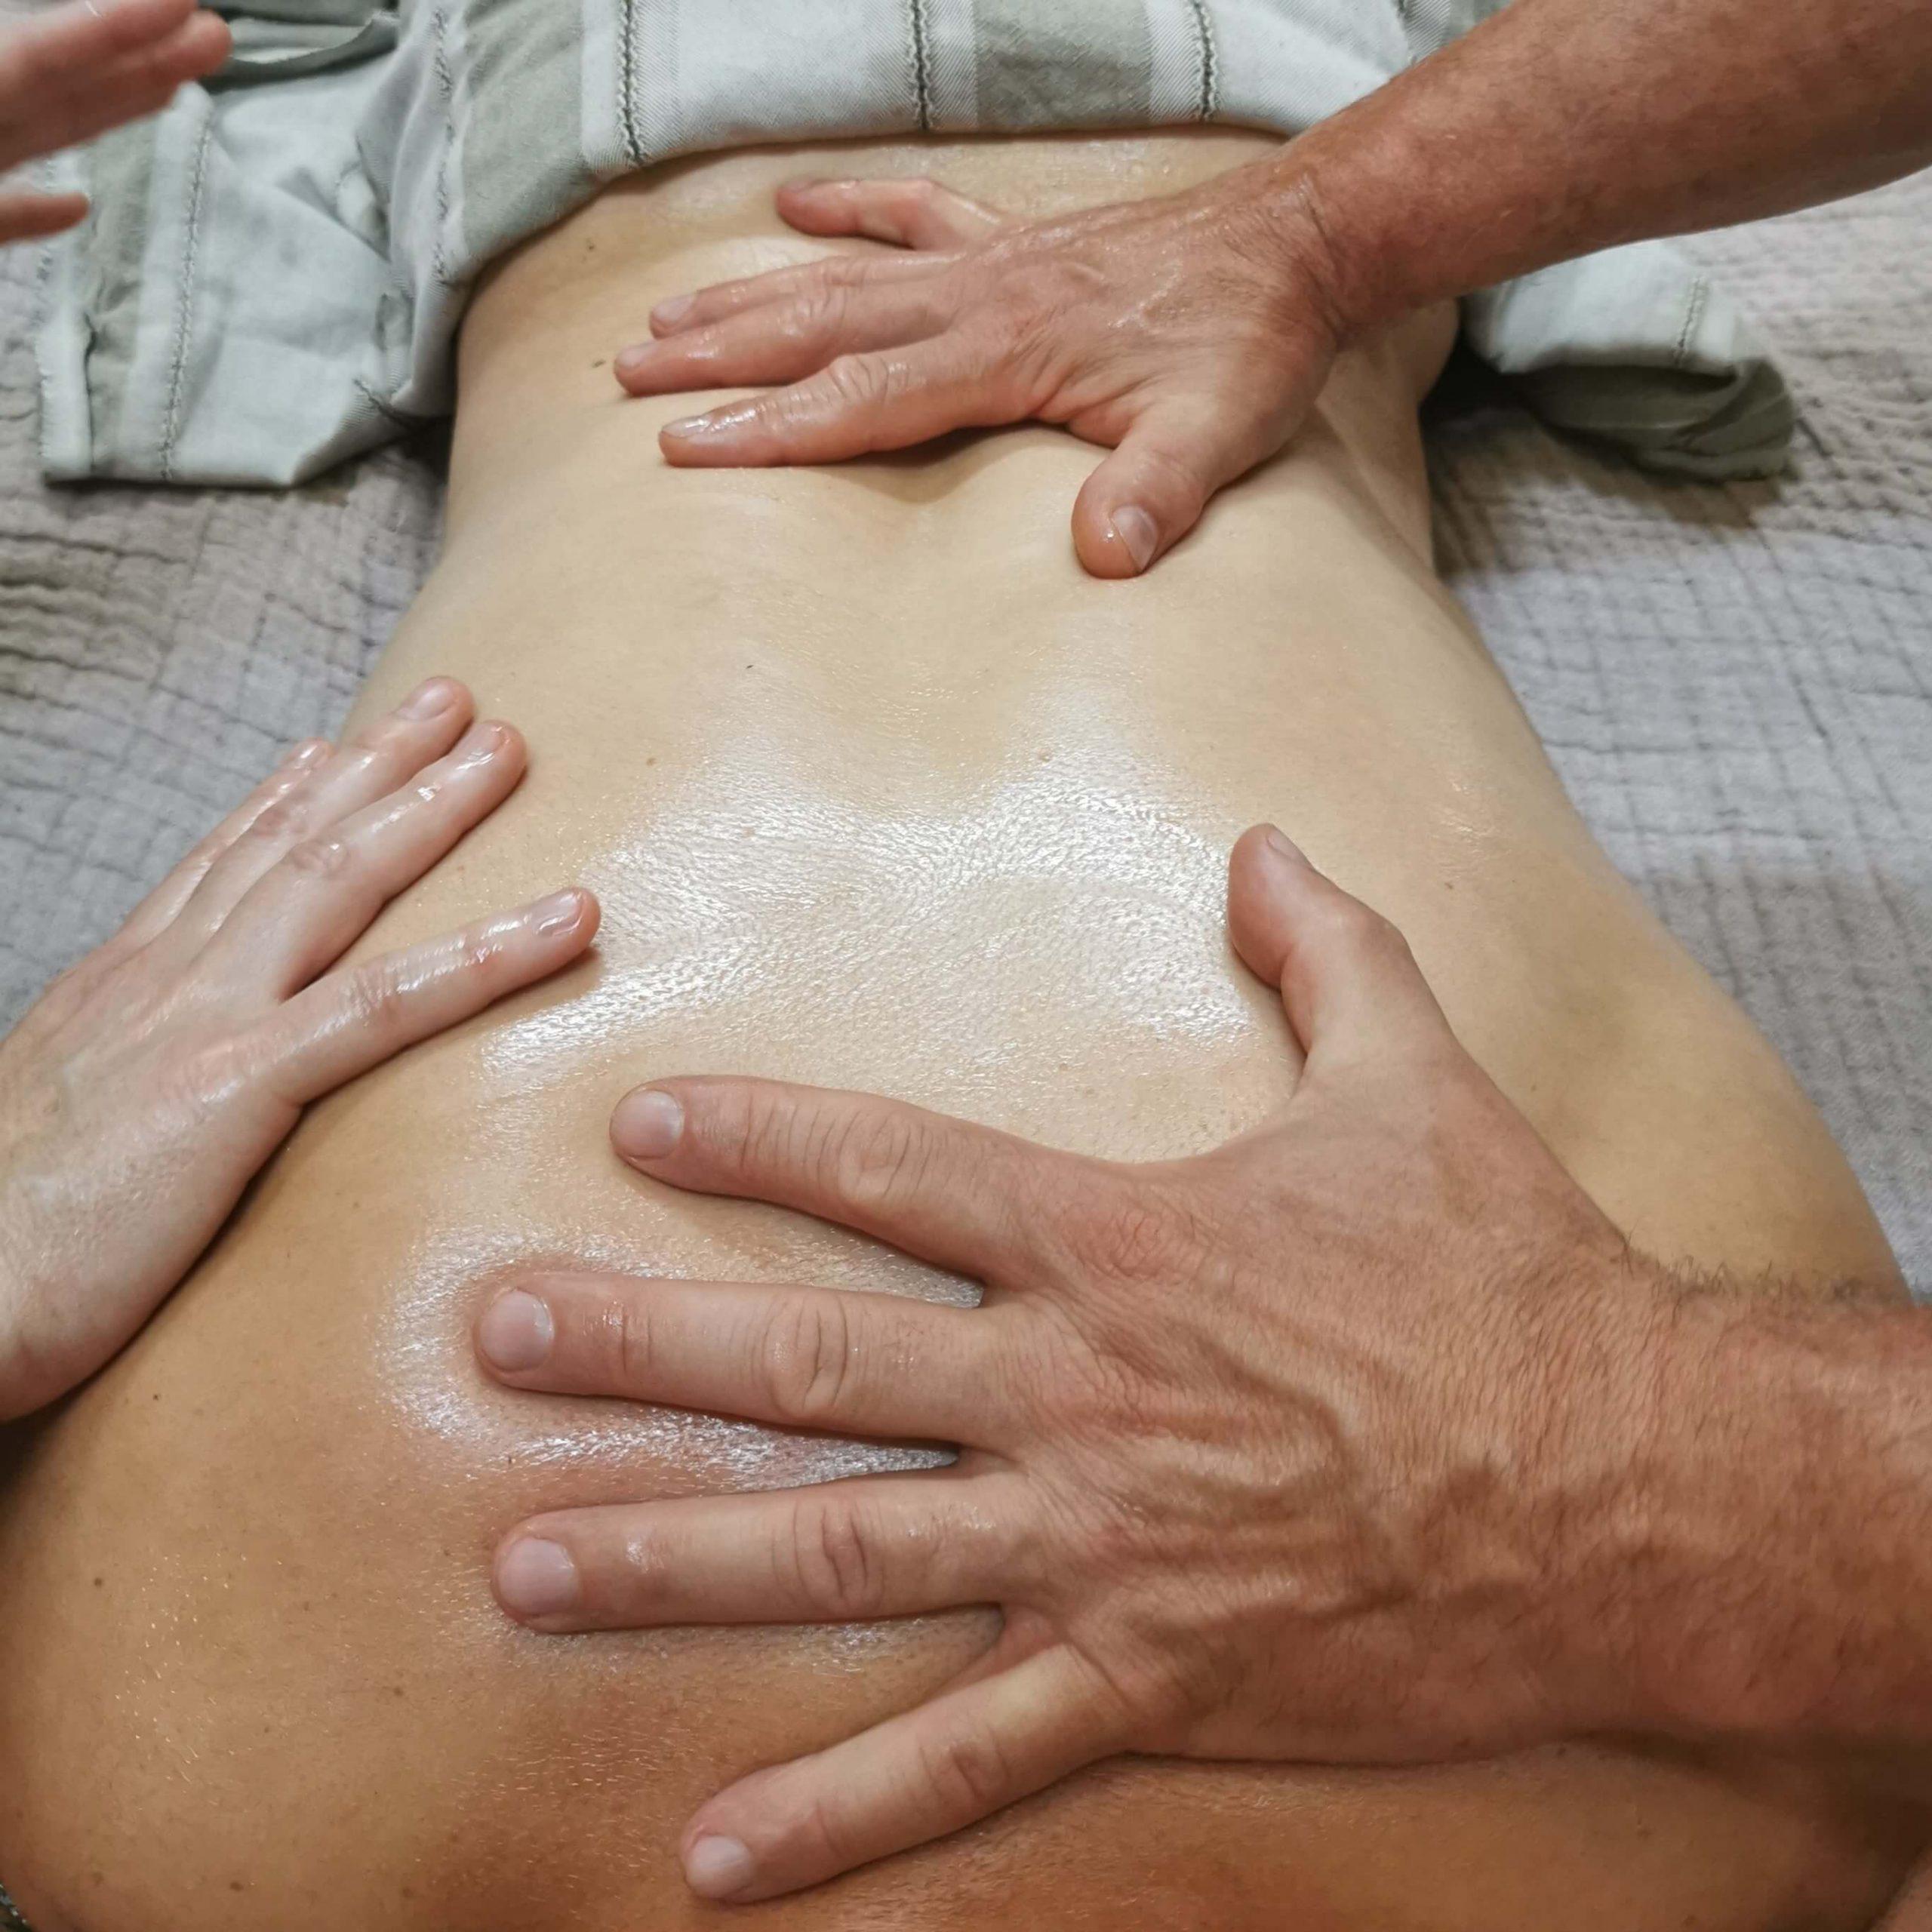 massage esprit tantra 4 mains landes